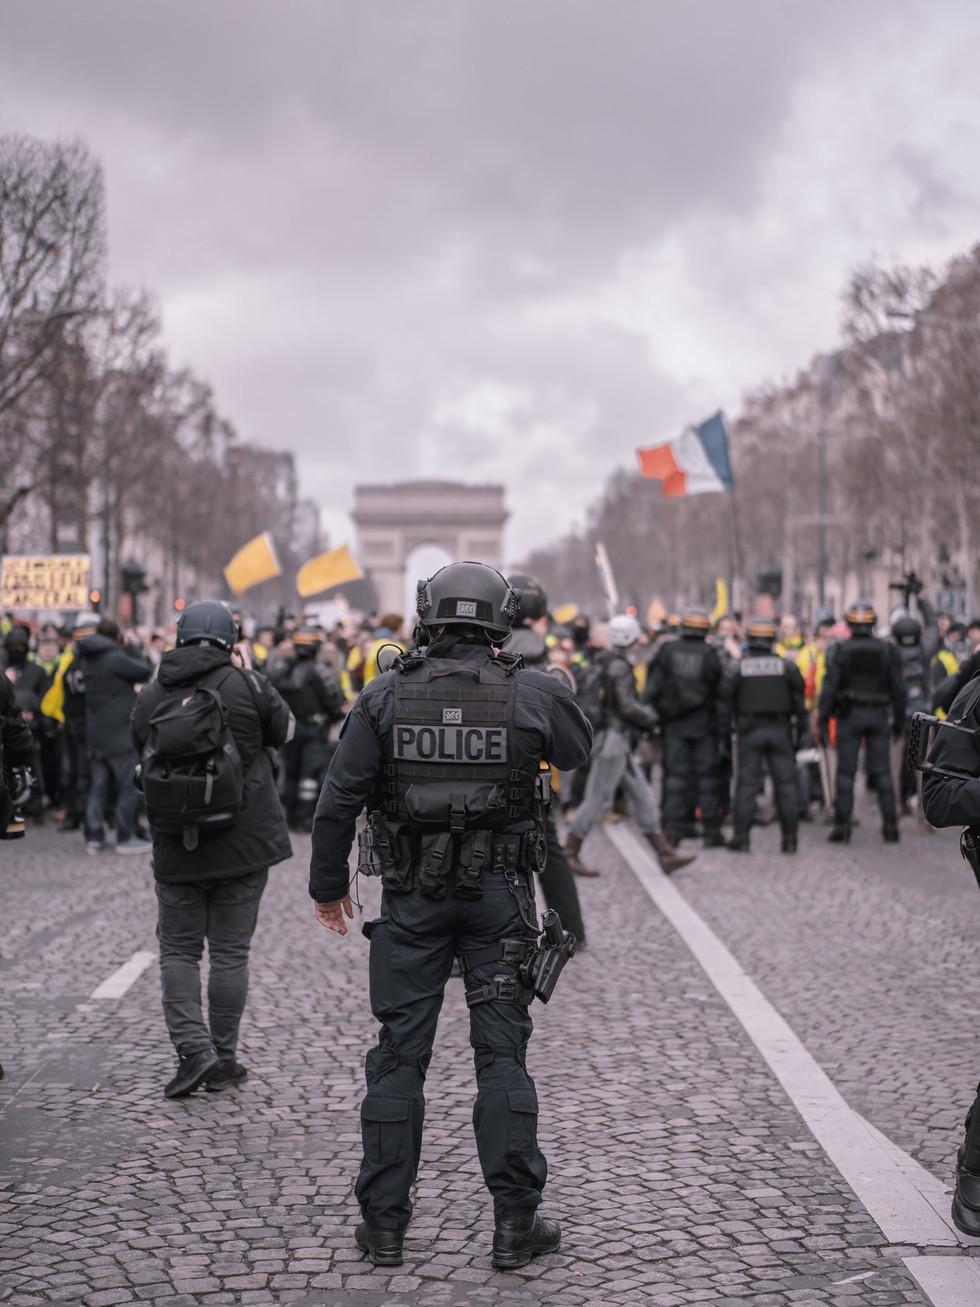 city-crowd-france-2348817.jpg